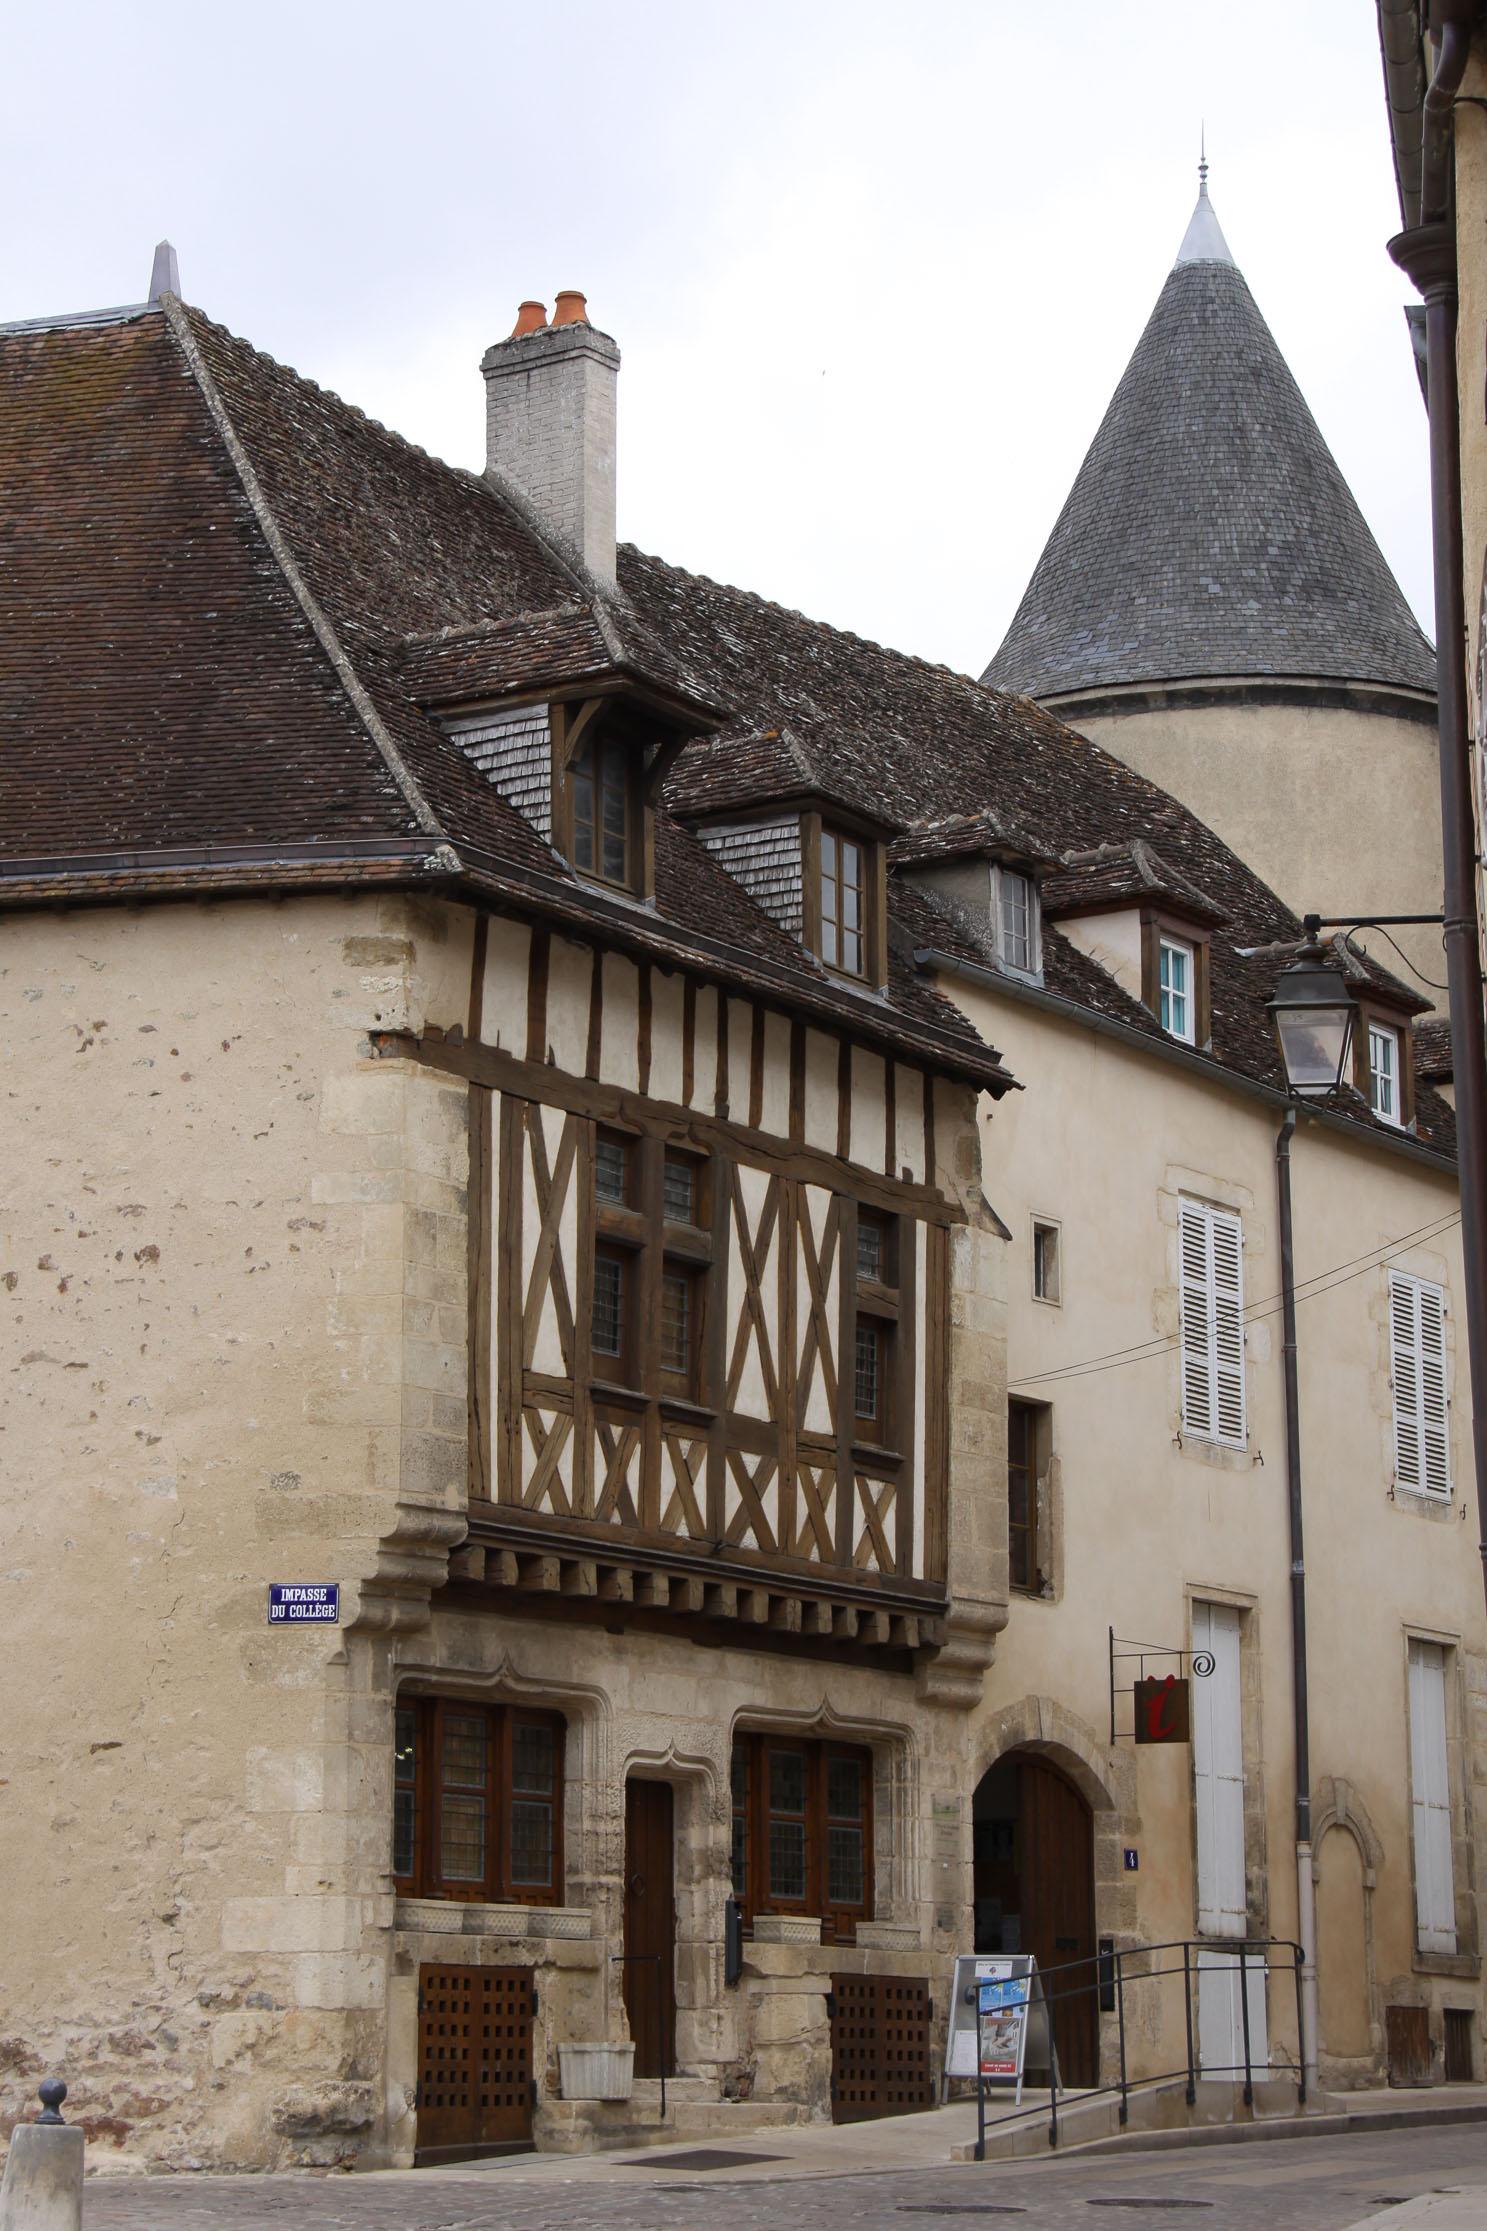 Avallon : Centre médiéval (5)